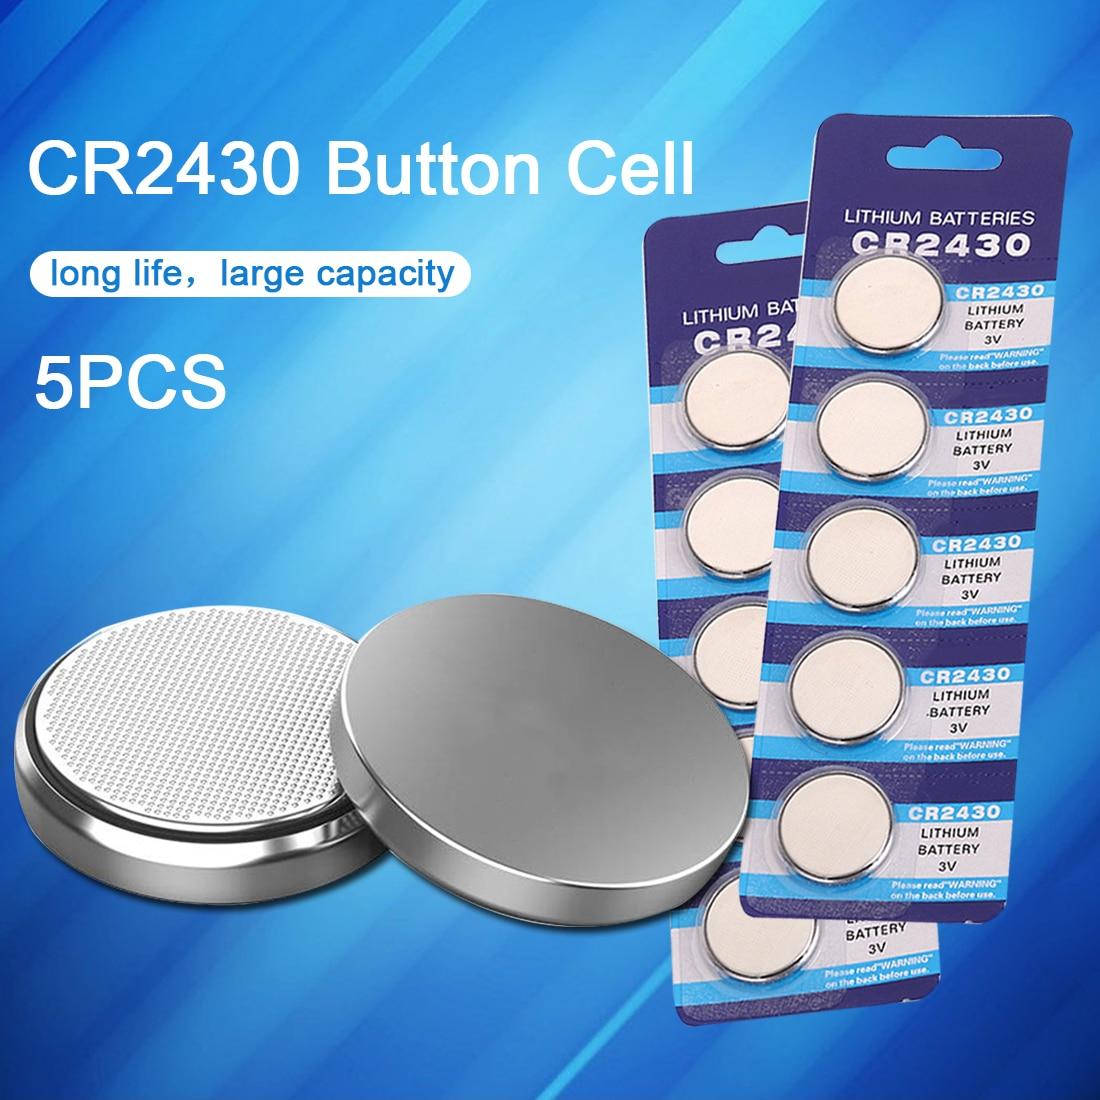 5 шт. CR2430 часы батарея кнопка батареи DL2430 BR2430 ECR2430 монет литиевые батареи для игрушек калькулятор часы